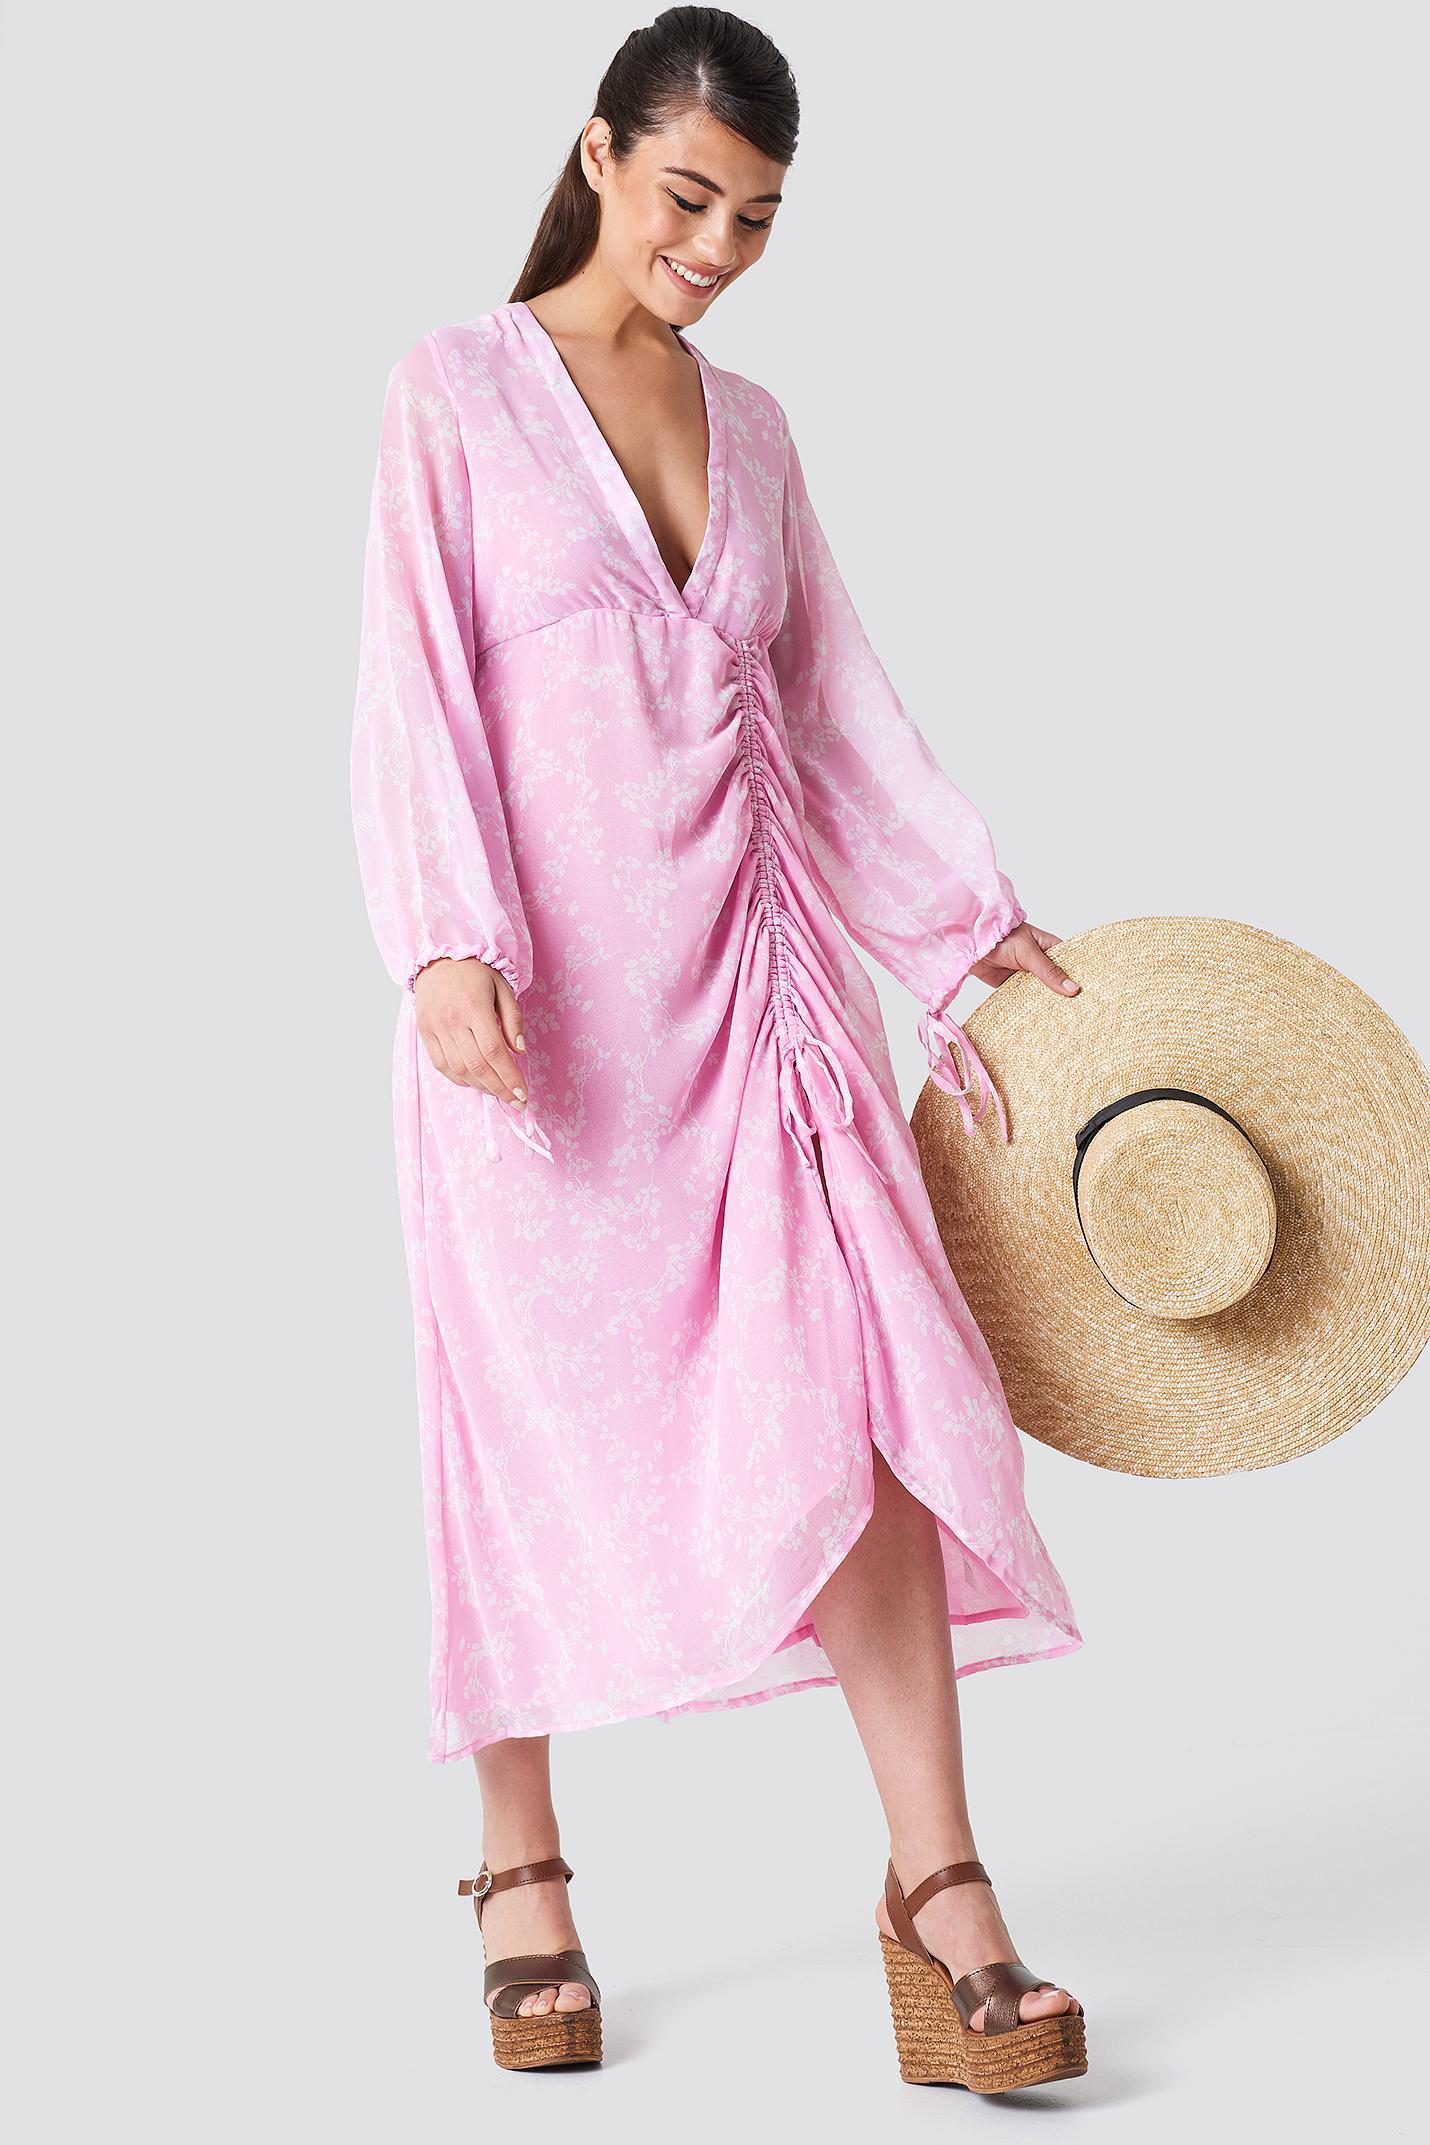 Lyst - Na-Kd Balloon Sleeve Drawstring Maxi Dress Pink white Blossom ... 1dff42f21d